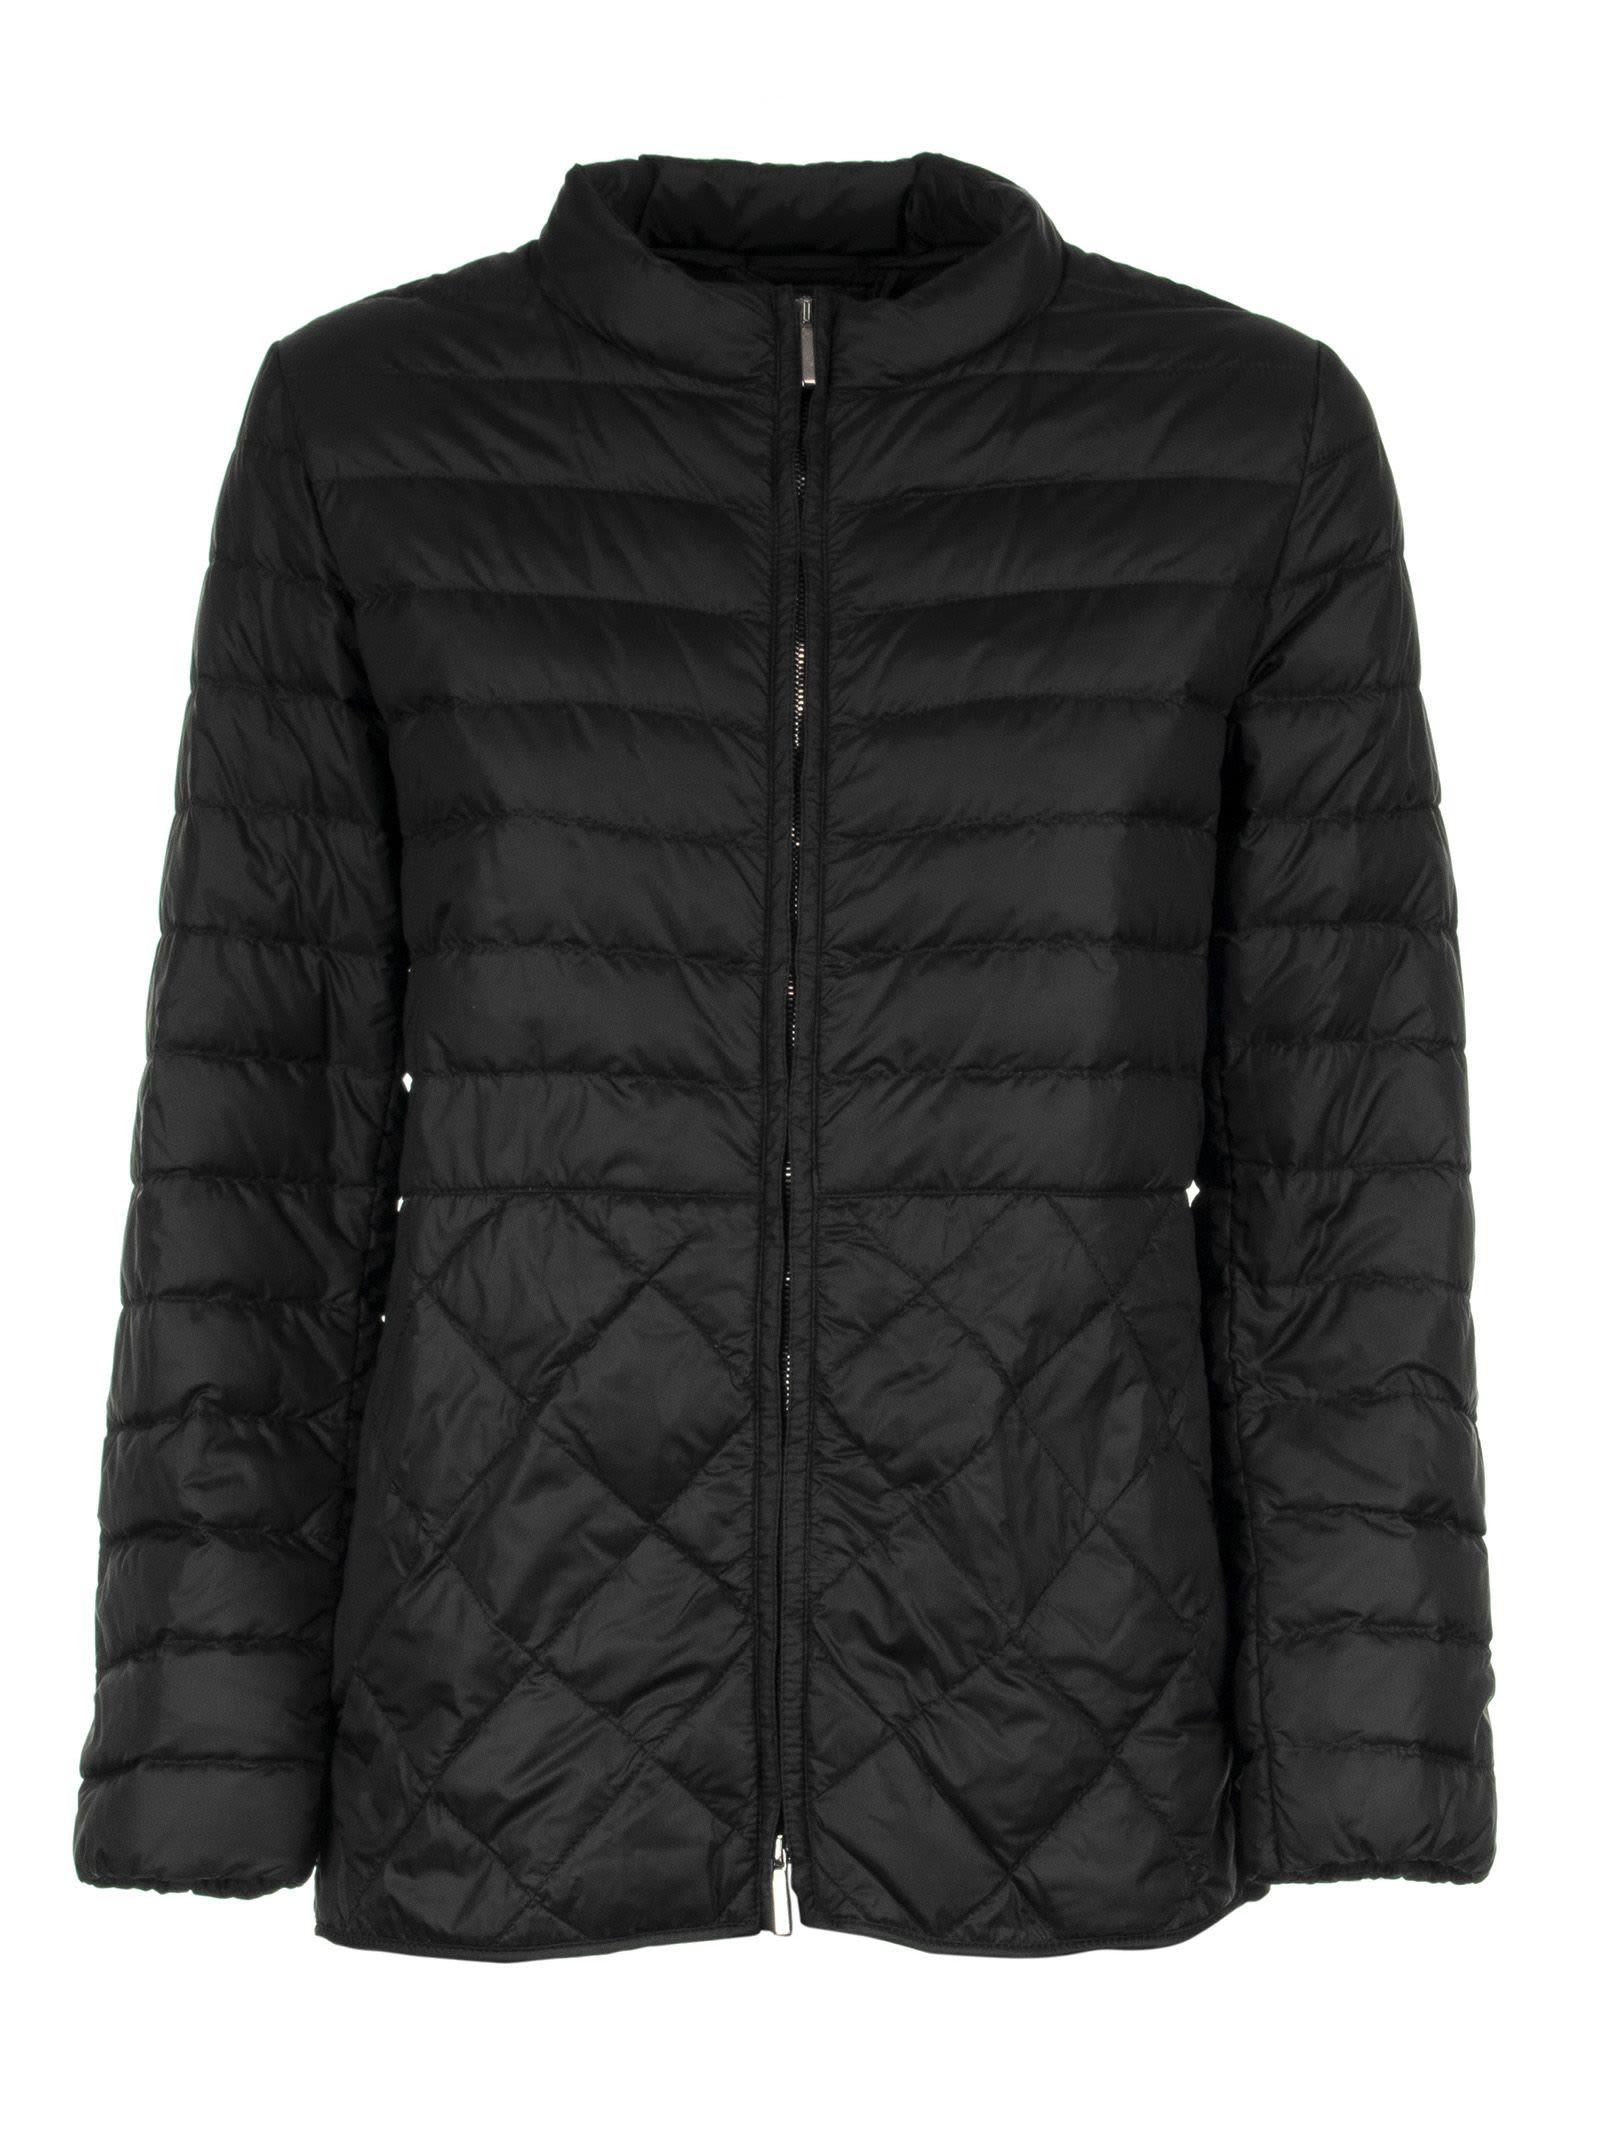 Photo of  Max Mara Etret Padded Jacket- shop Max Mara jackets online sales